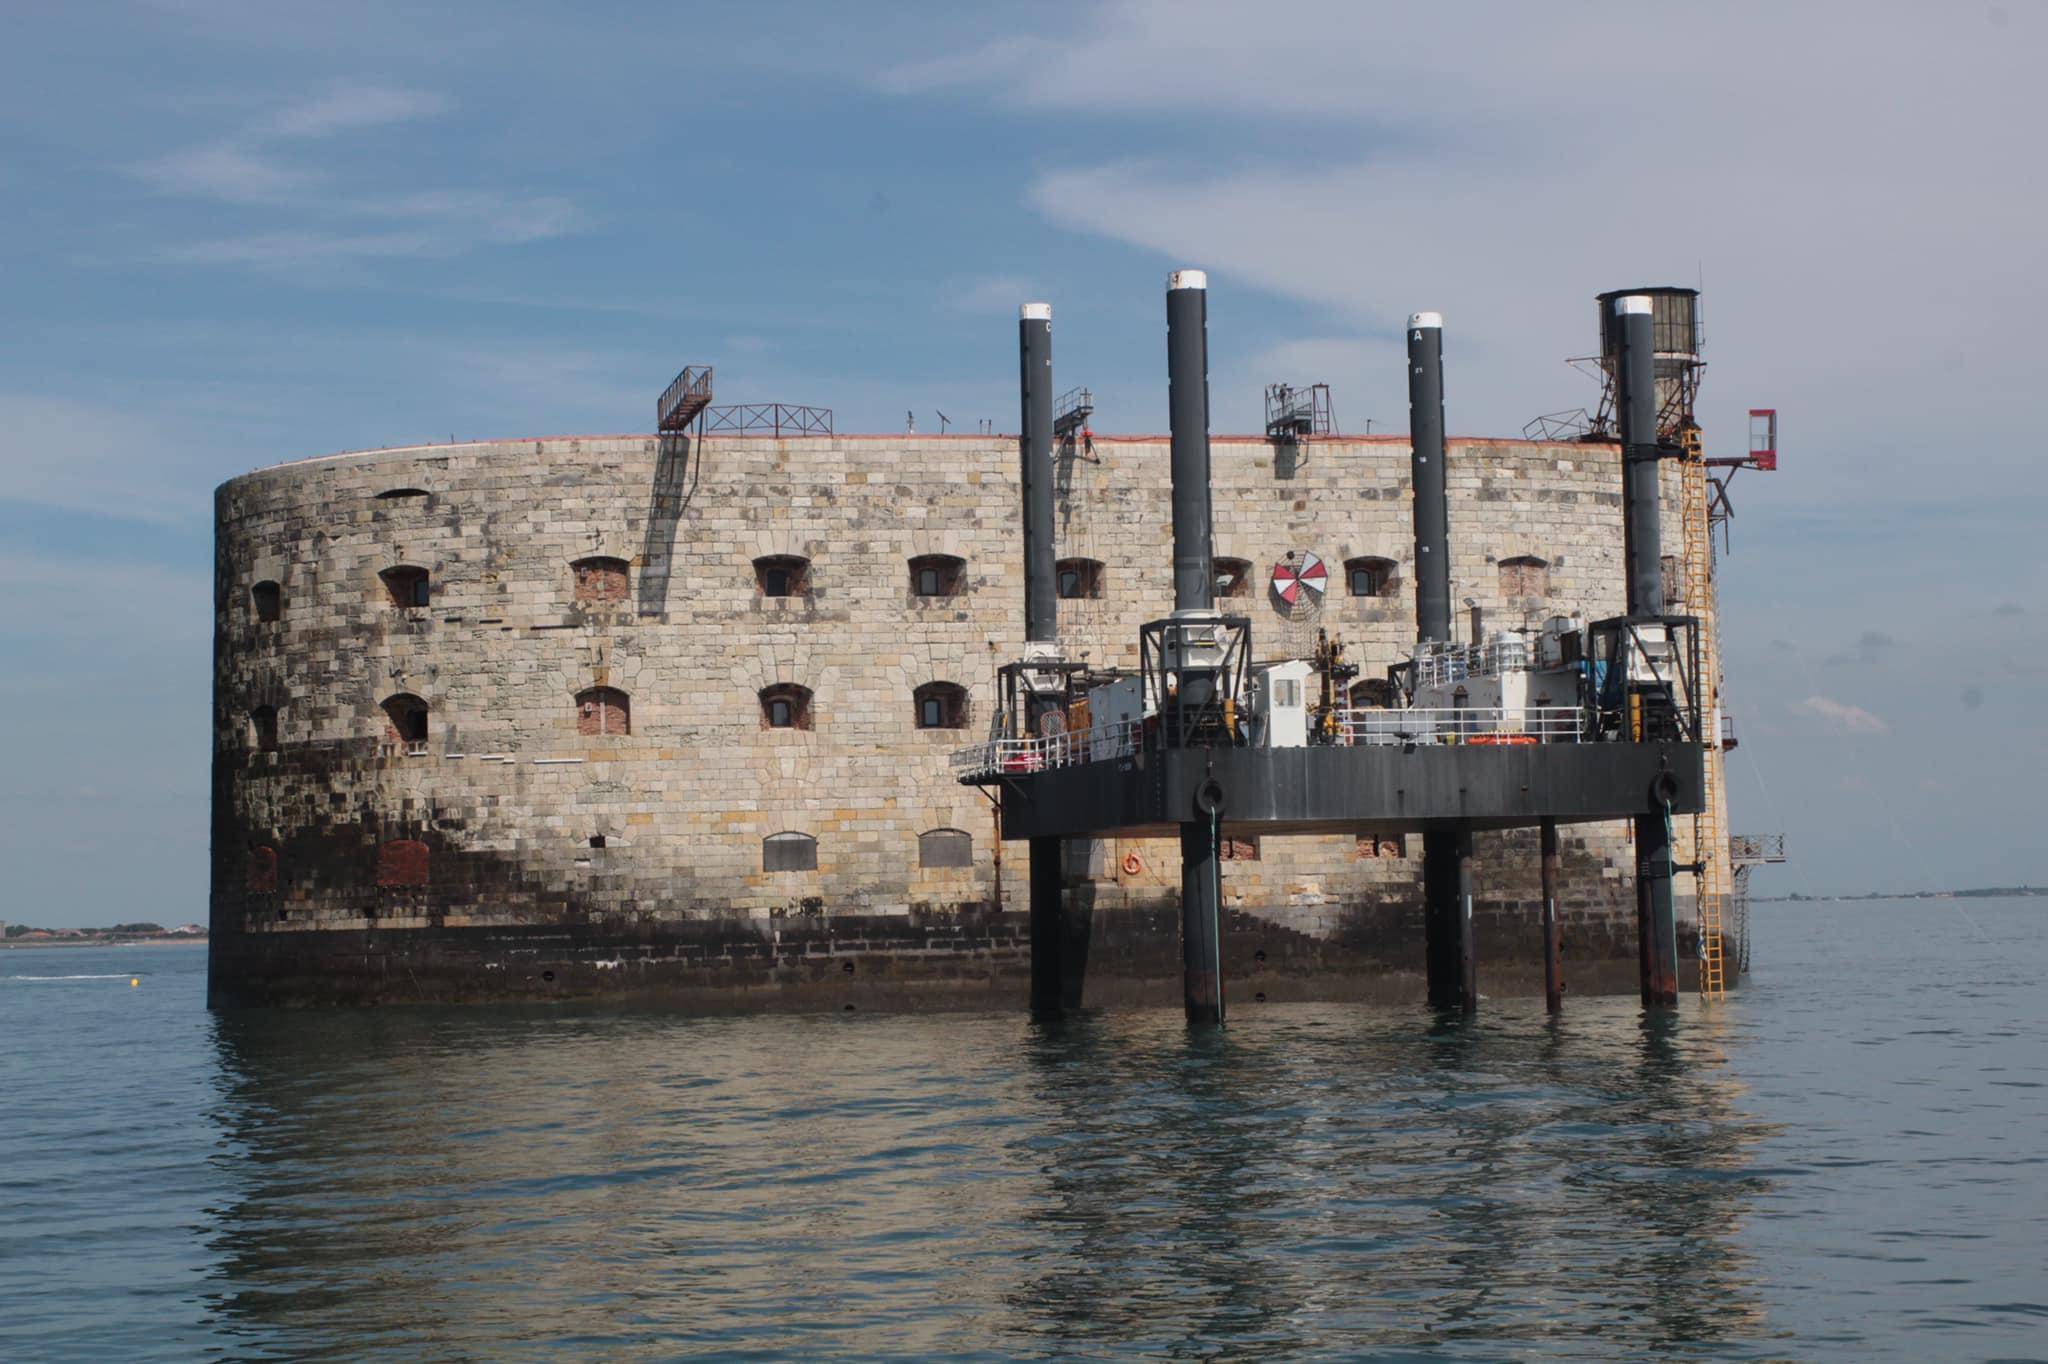 Photos des tournages Fort Boyard 2021 (production + candidats) - Page 6 18433110